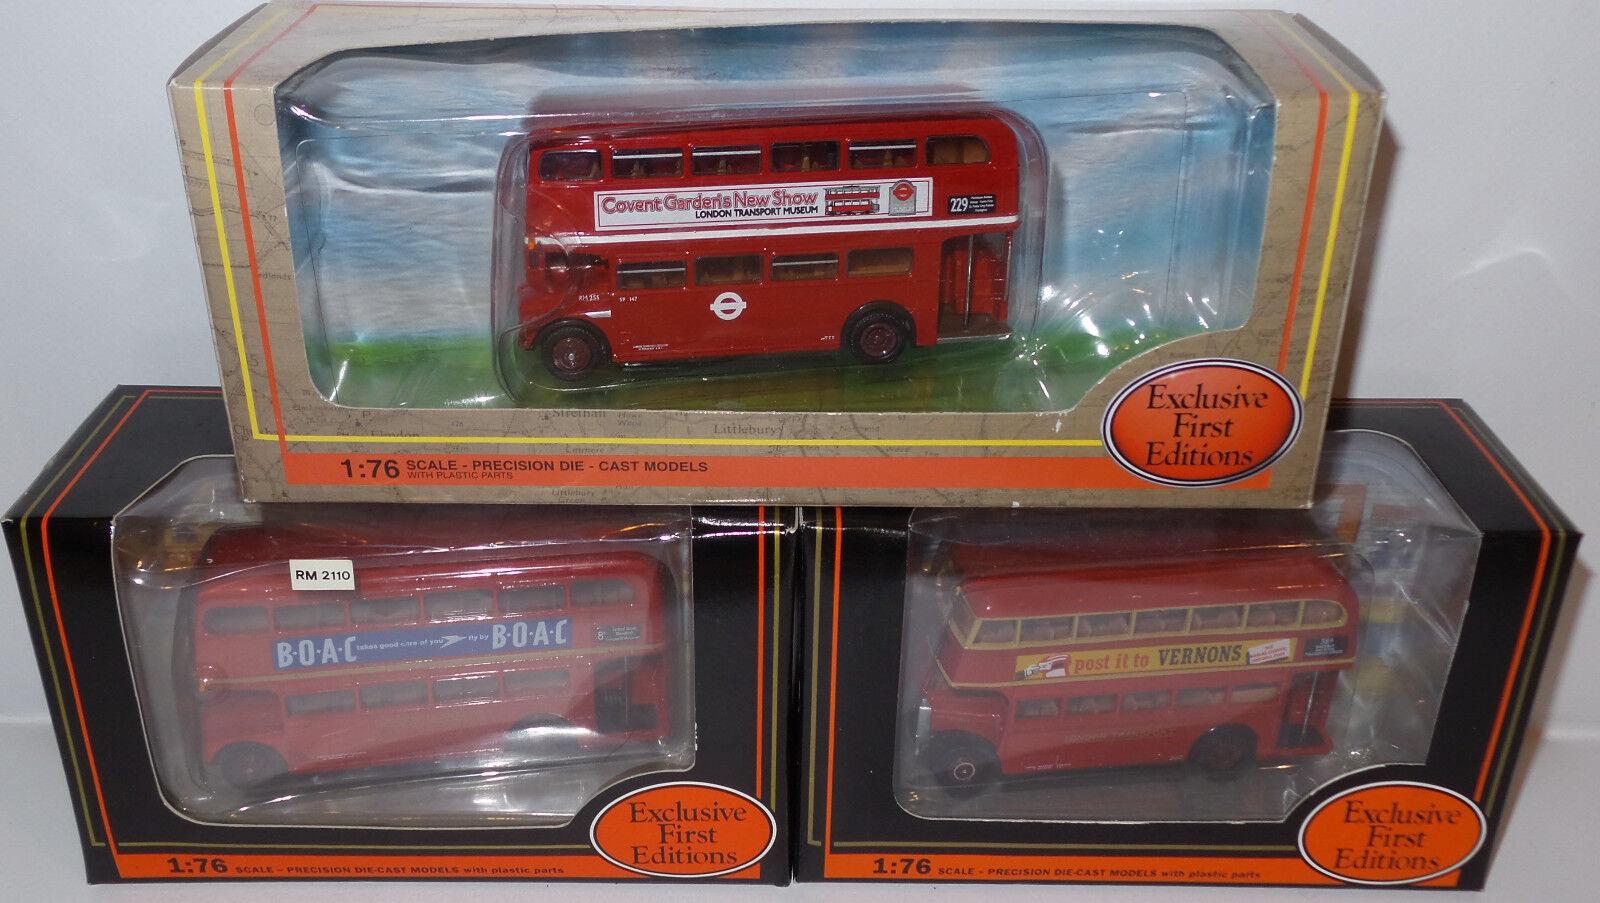 Autobuses  ruta Master B.O.A.C, Rm Routemaster, Lt Std, 20201, 31504, RM2110 (DT)